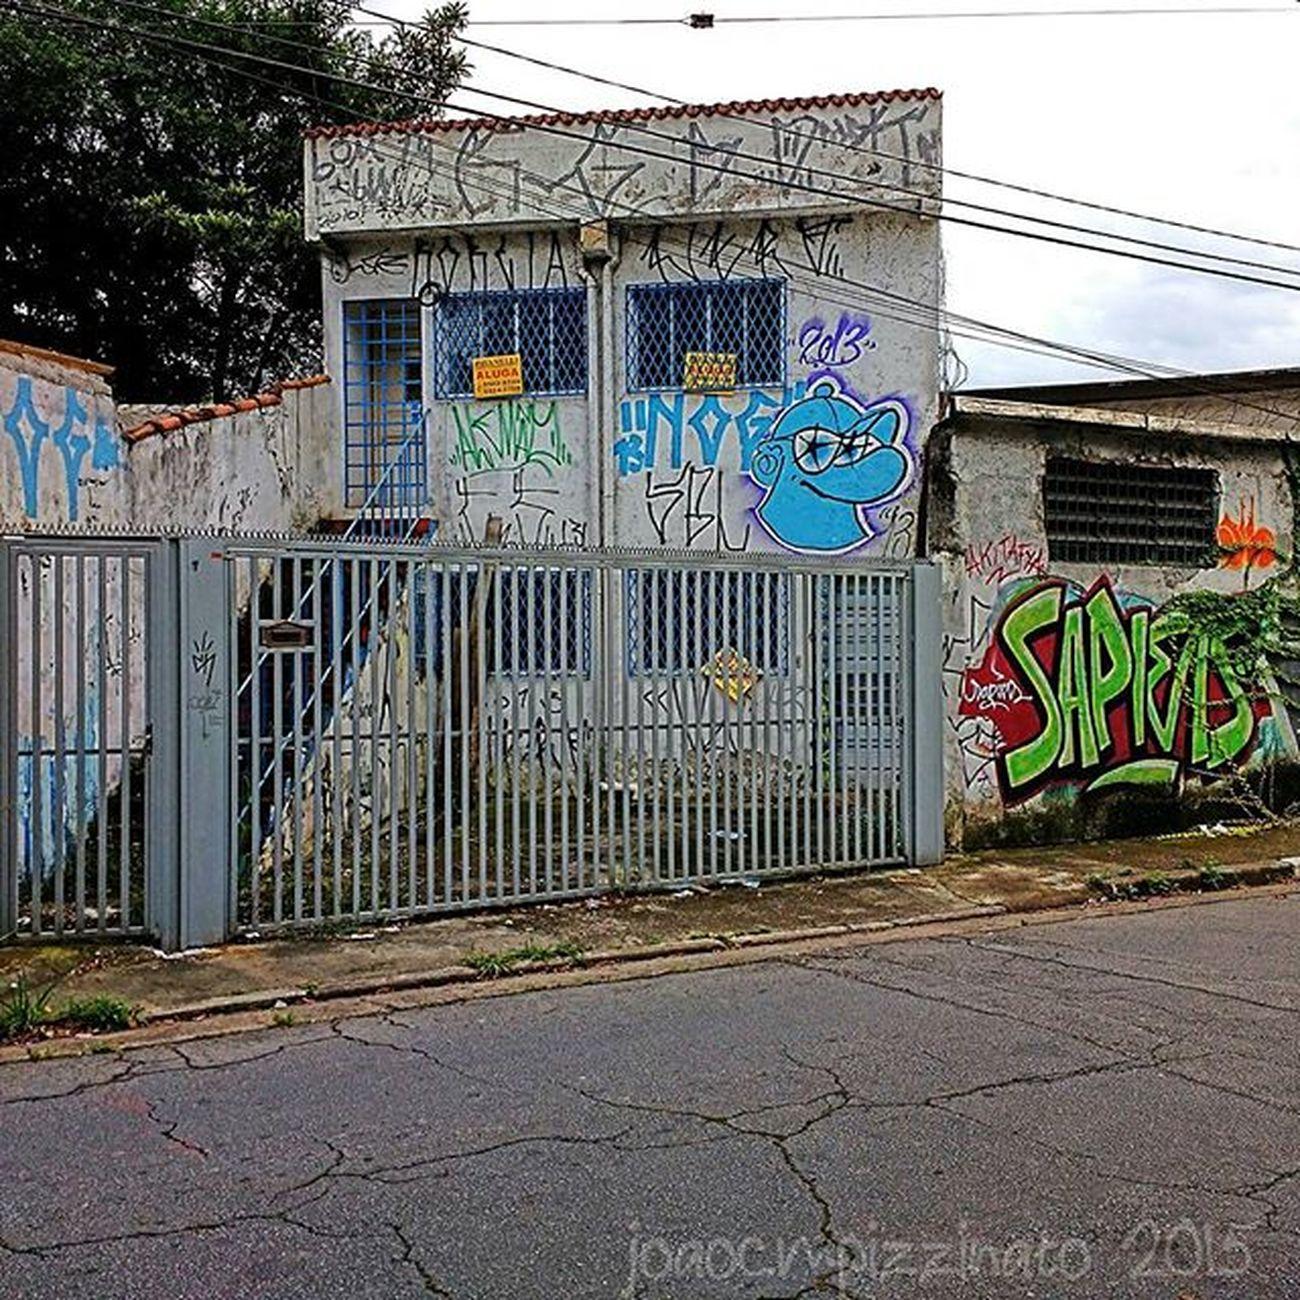 Graffiti Graffitiart Art Streetart UrbanART Streetphotography Urban Streetphoto_brasil Super_saopaulo Icu_brazil Ig_mood Saopaulo_originals Saopaulowalk Ig_brazil Sp4you Sp360graus Spdagaroa Mybeautifulsp Splovers Olhar_brasil Olhardesp Nasruasdesp011 Urbexbrasil Mundoruasp Olhonaruasp